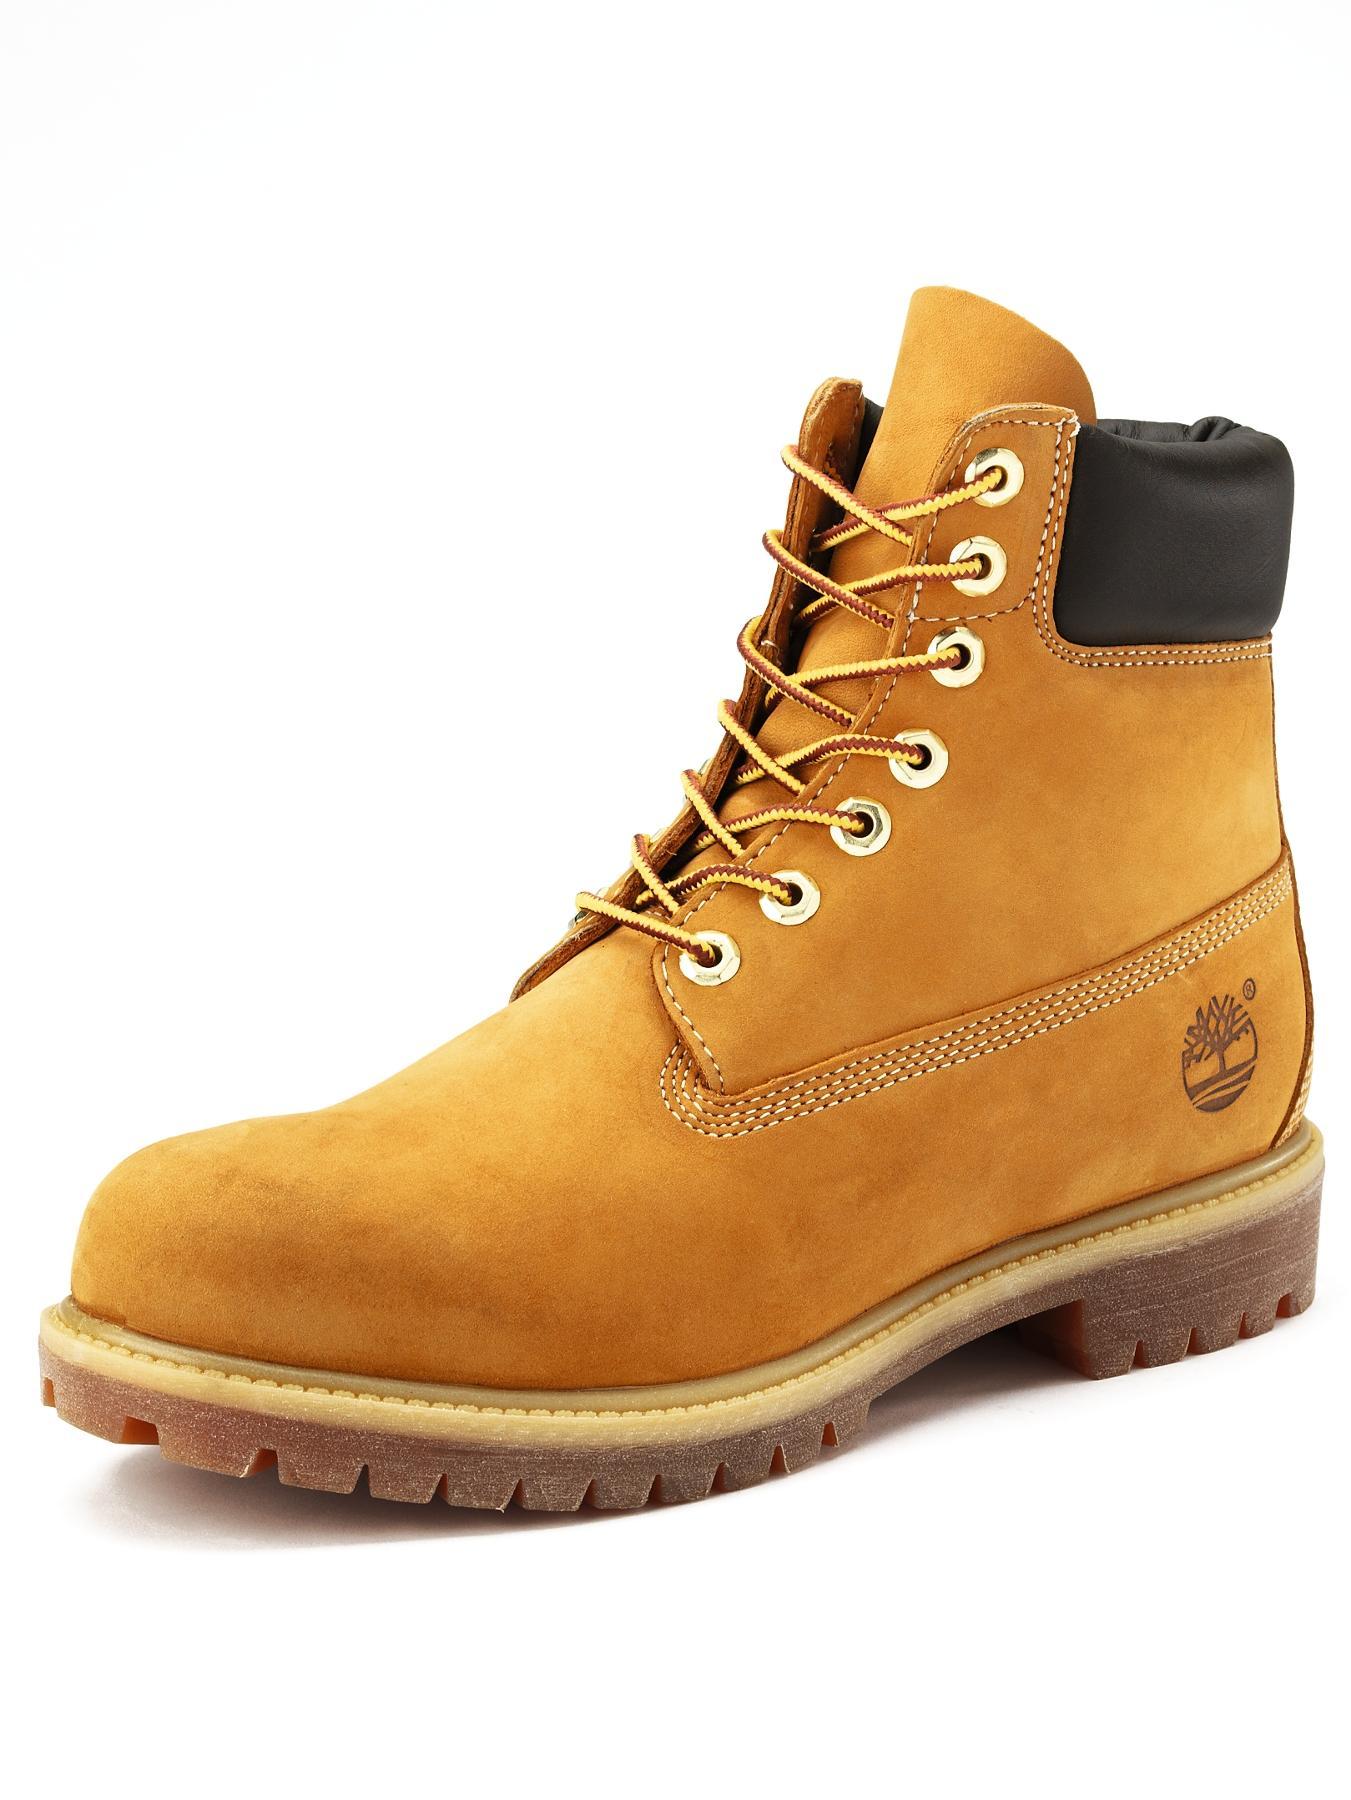 timberland shoes uk sale